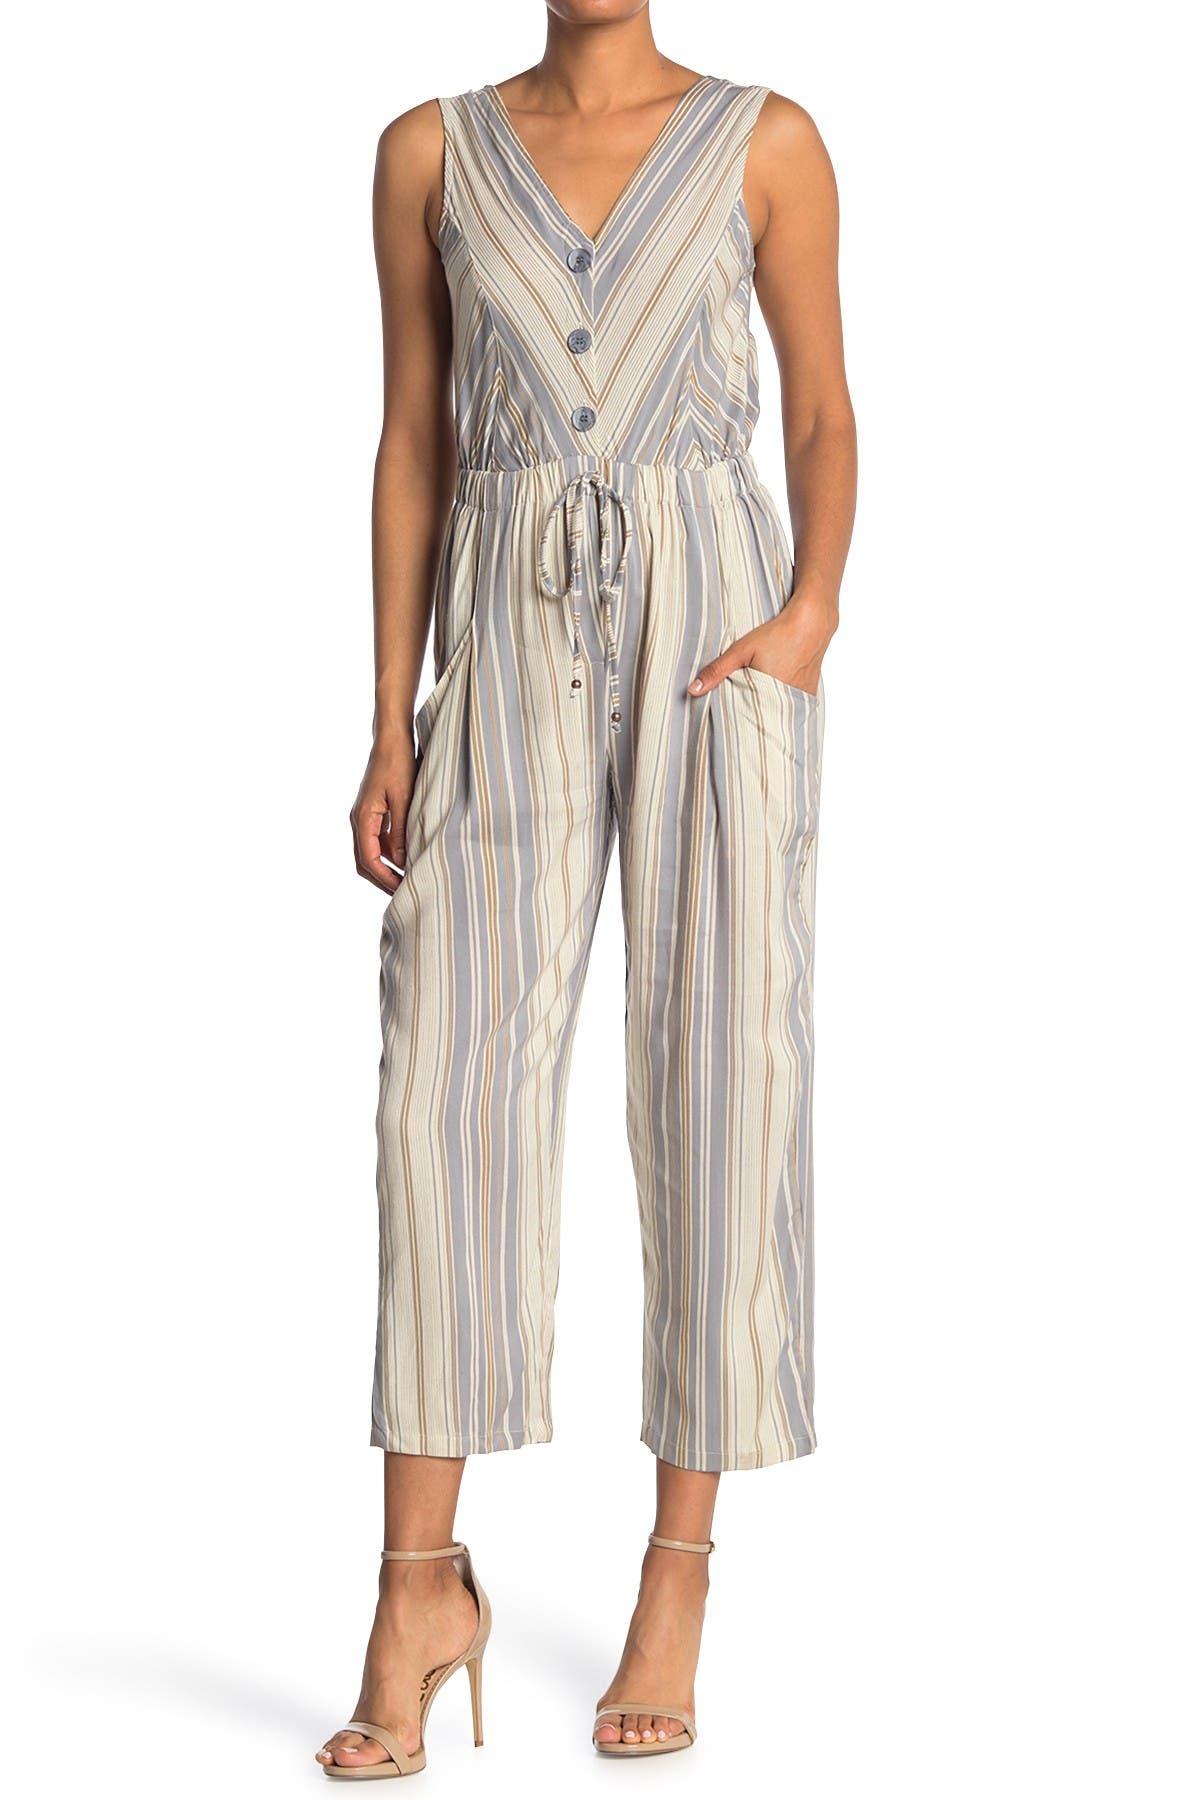 Image of Angie Stripe Print Crop Jumpsuit